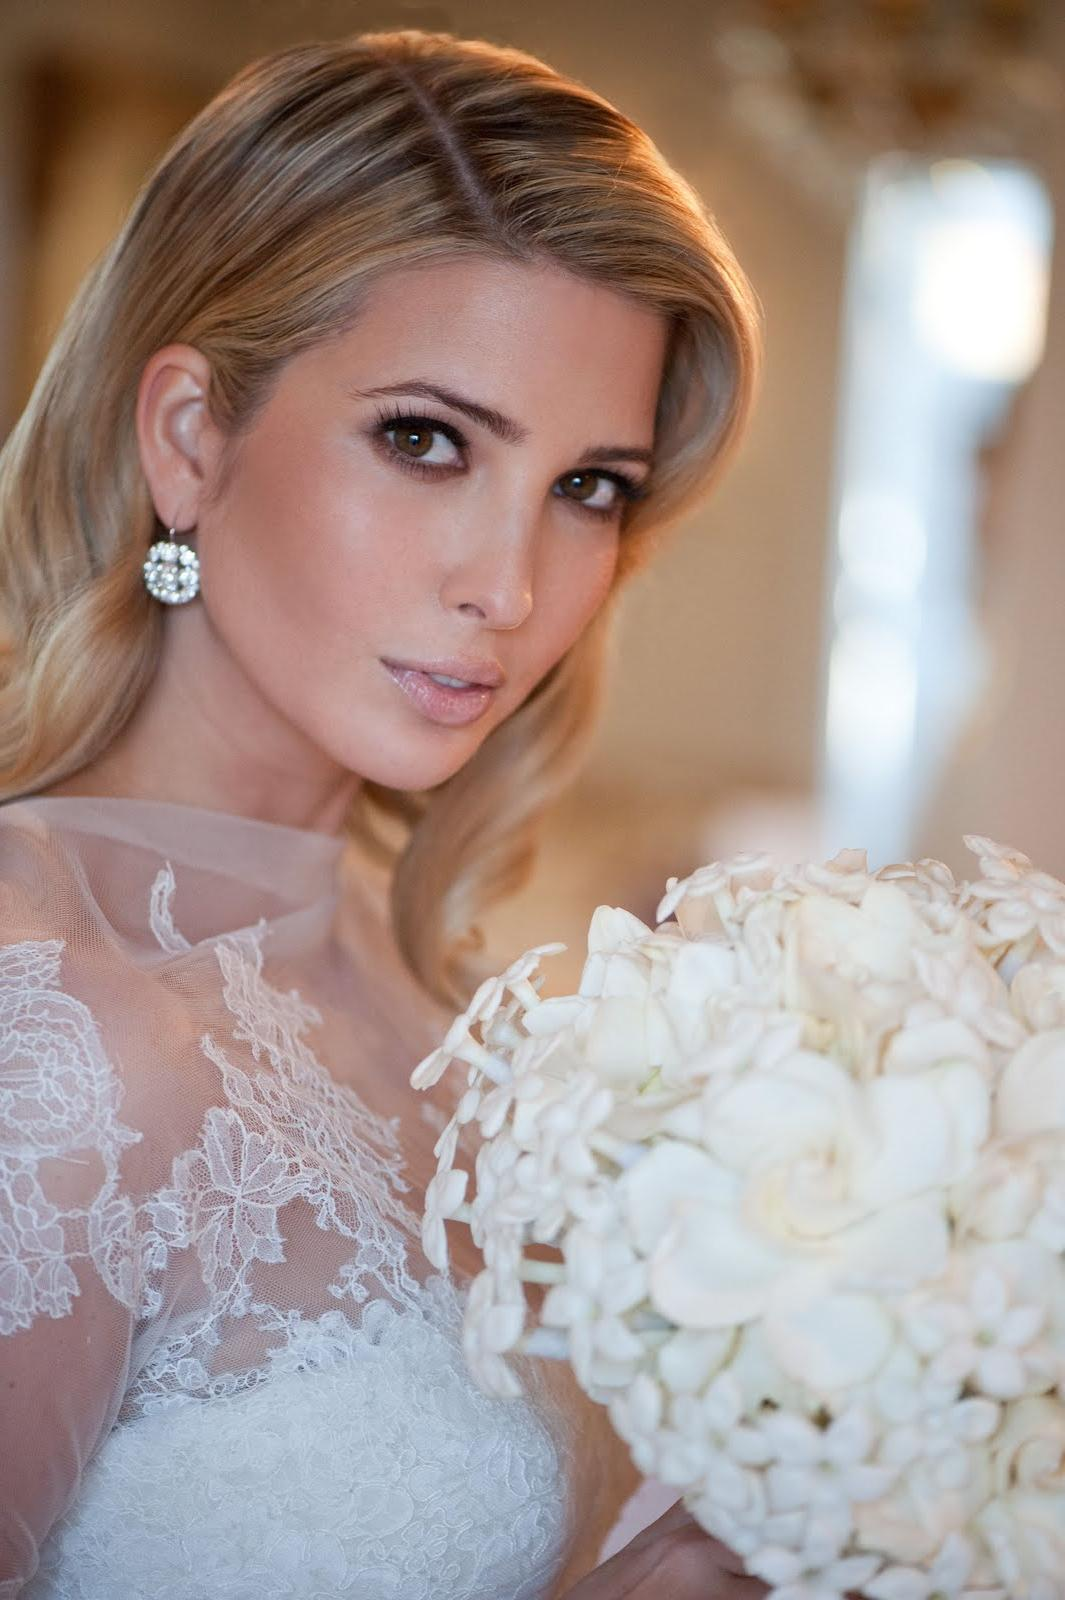 ivanka trump wedding makeup